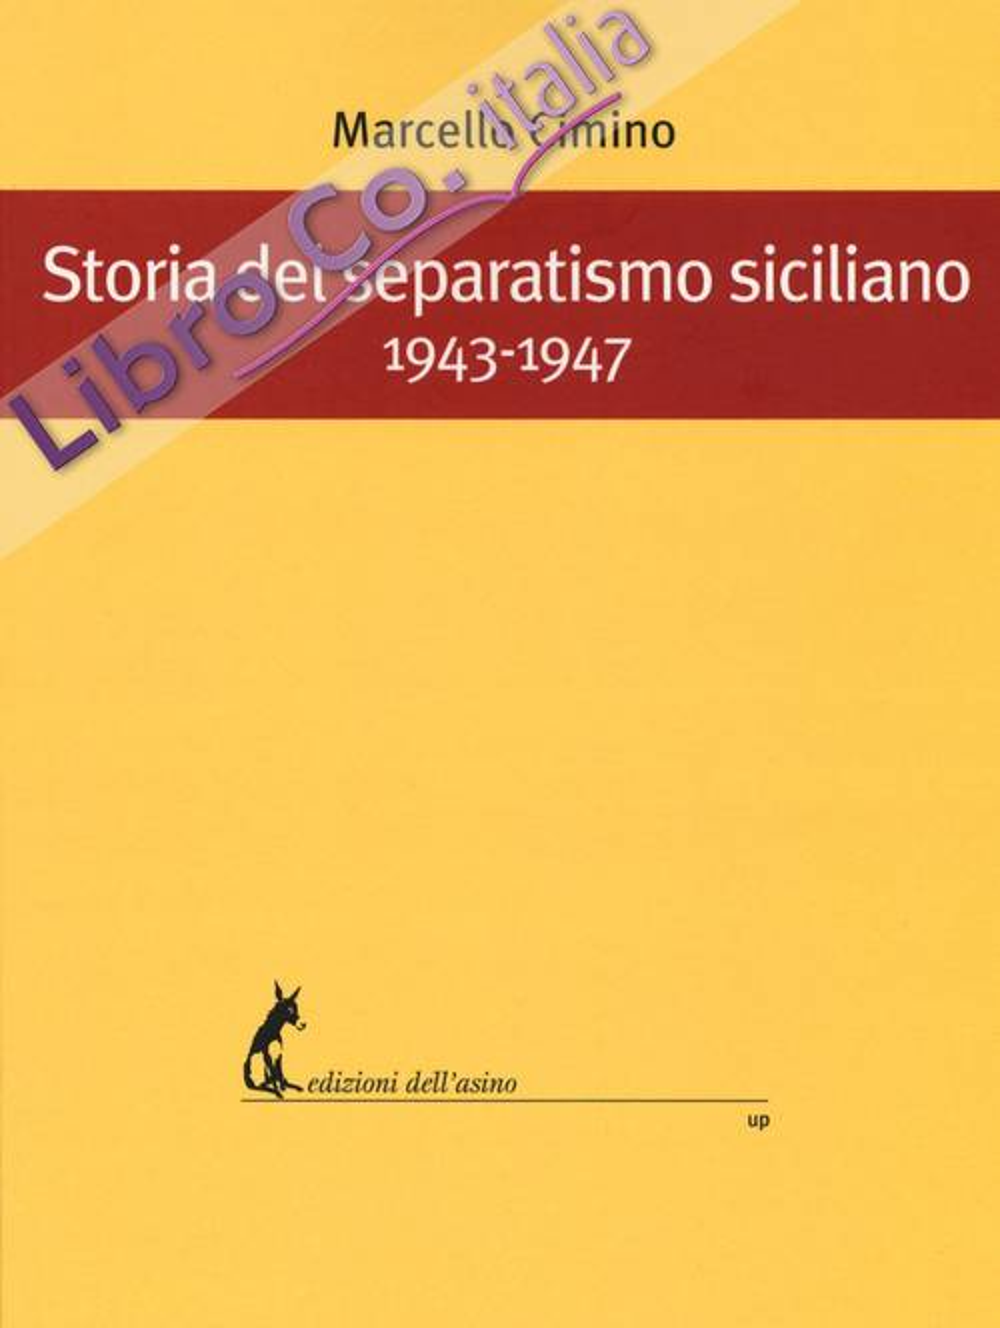 Storia del separatismo siciliano. 1943-1947